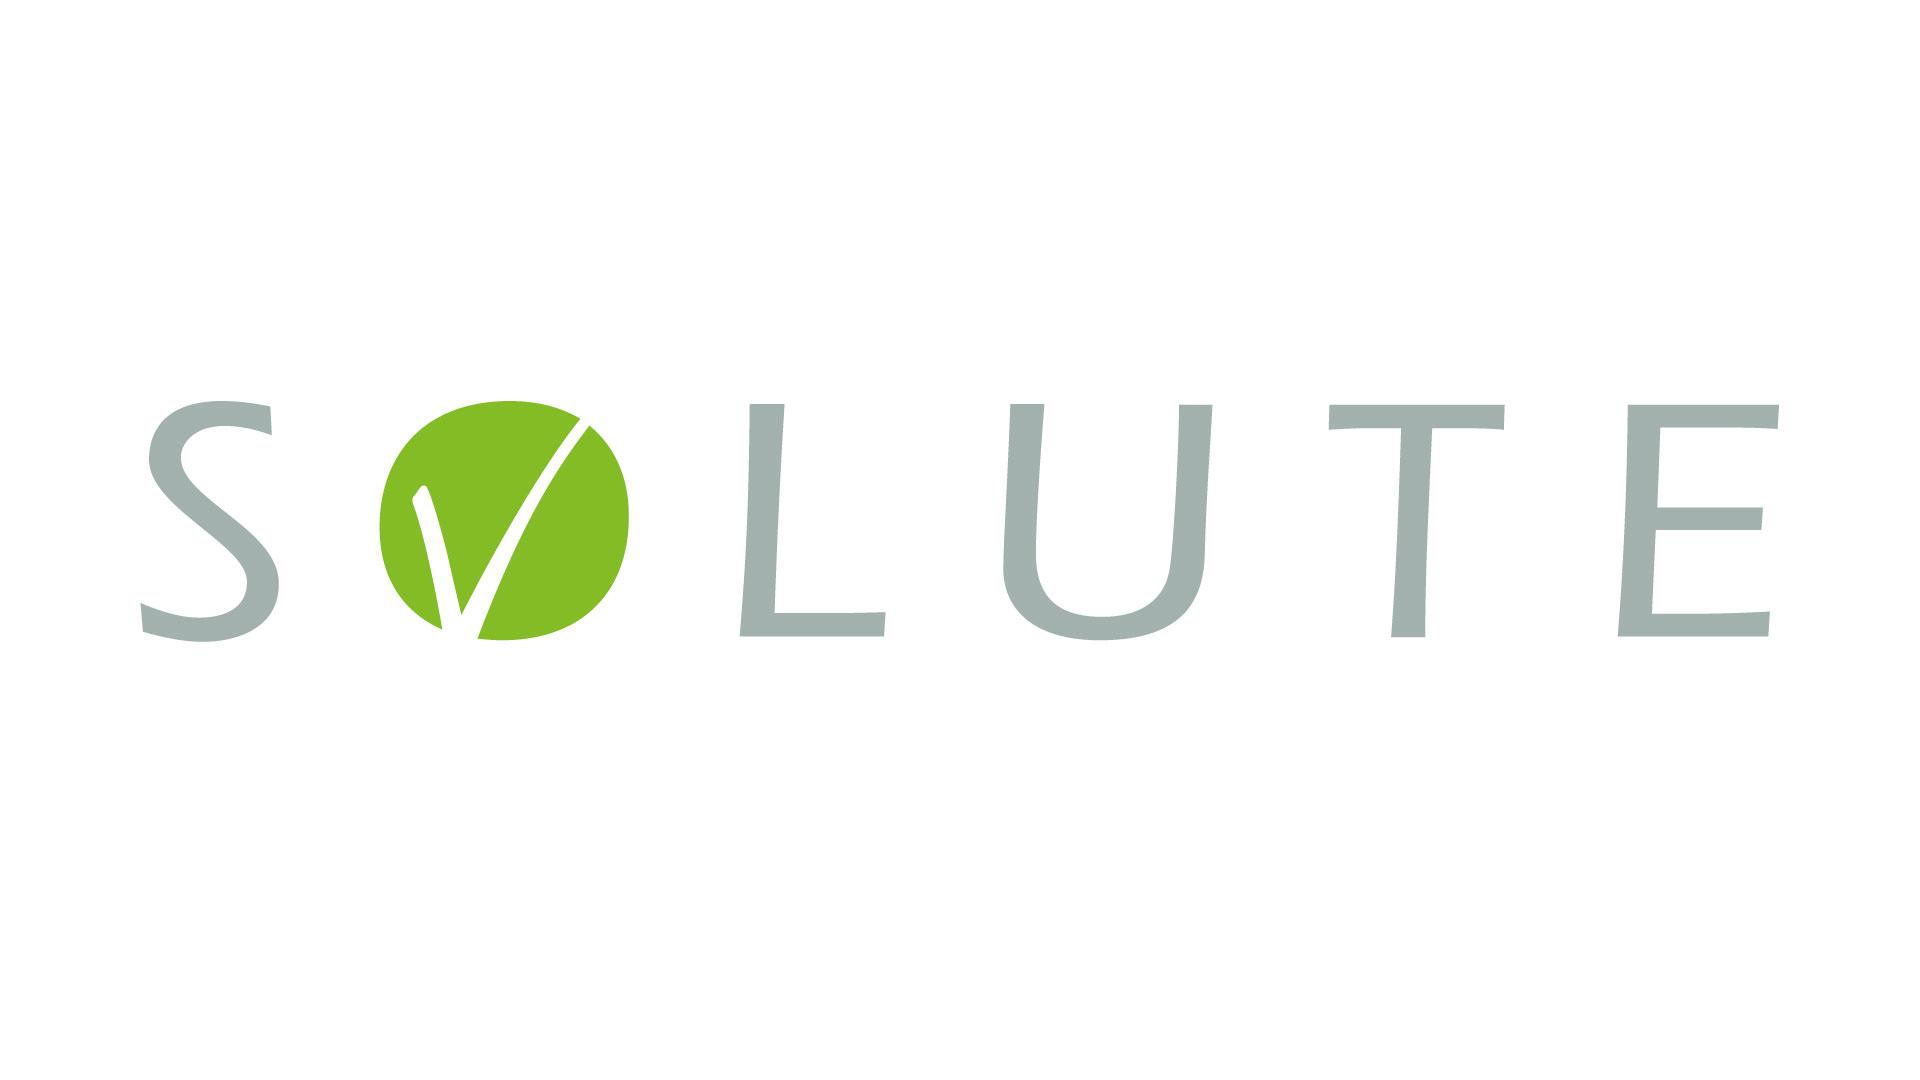 Karriere - SOLUTE recruiting GmbH : SOLUTE recruiting GmbH